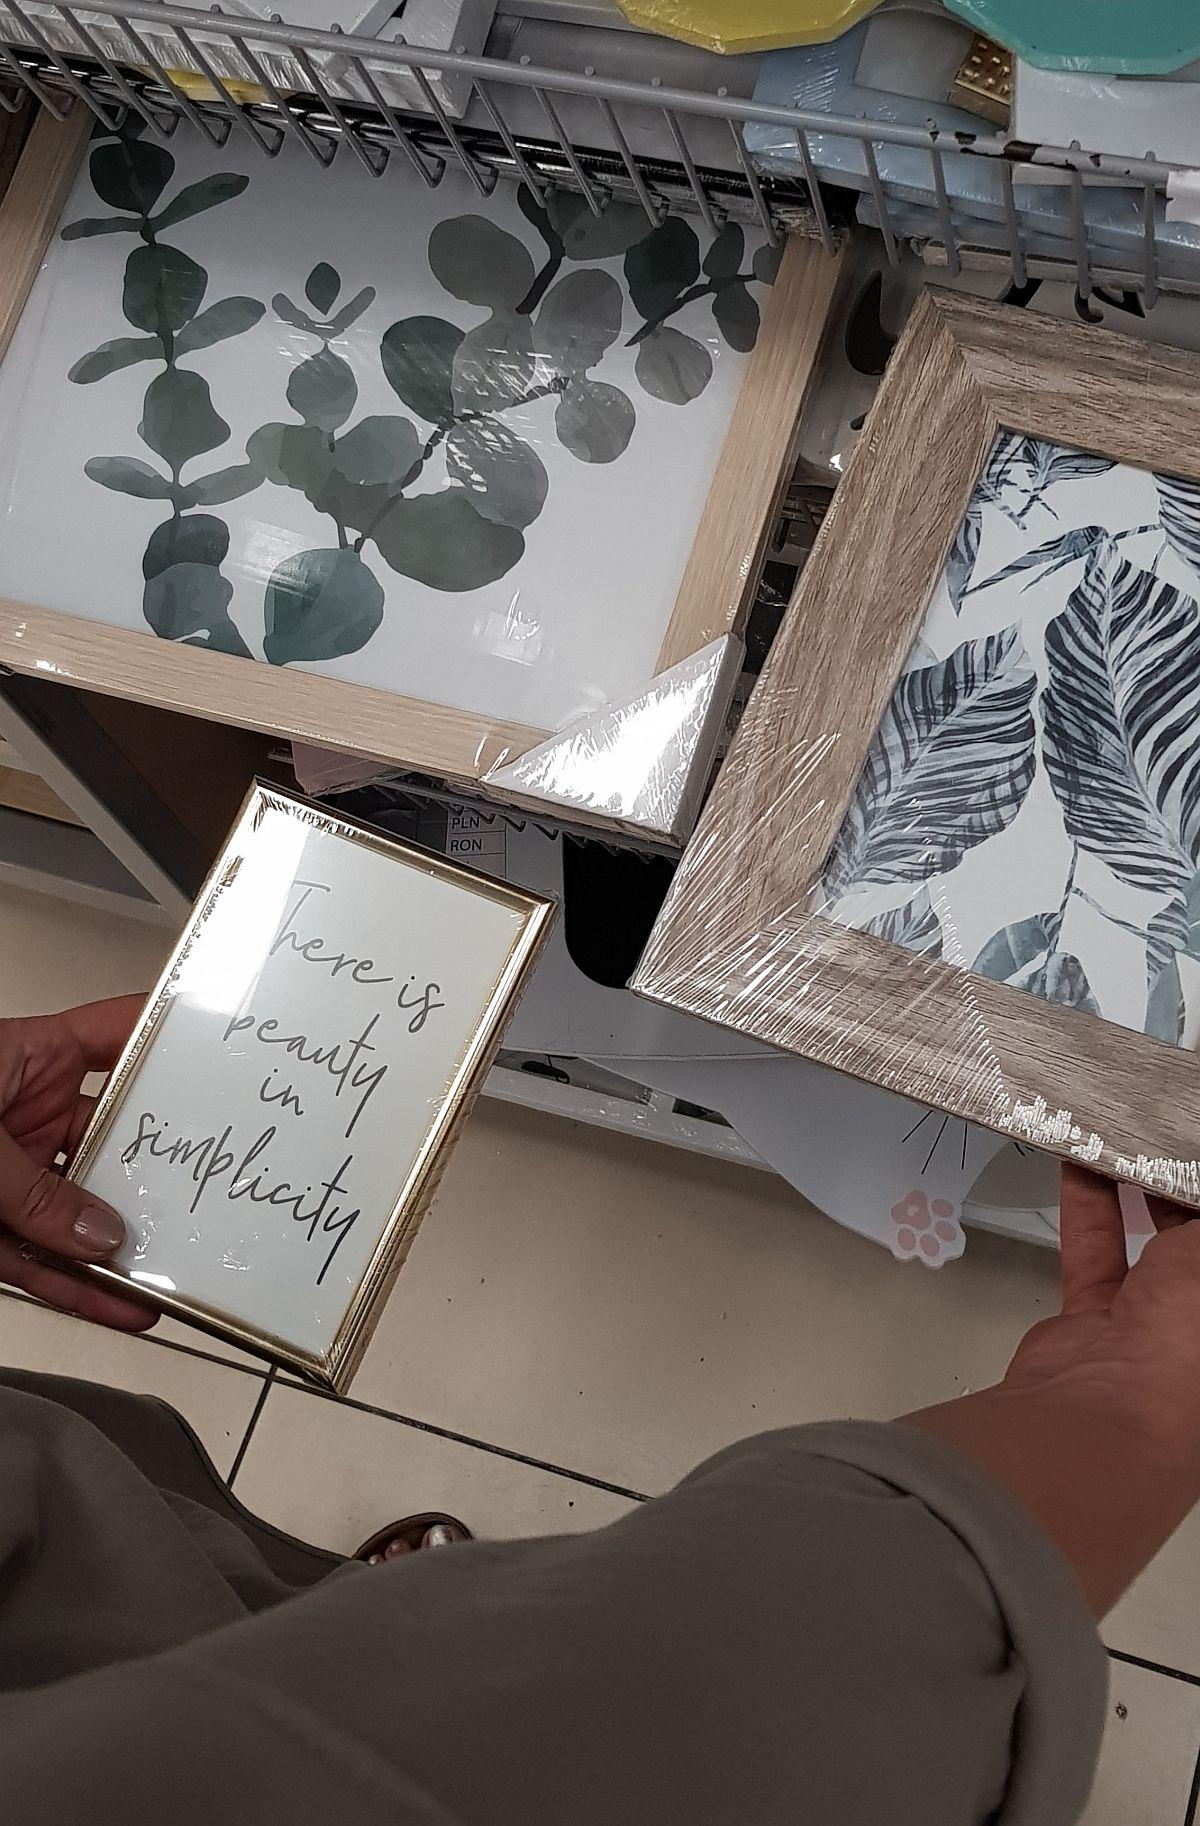 adelaparvu.com despre decoratiuni la pret bun in magazine,Pepco